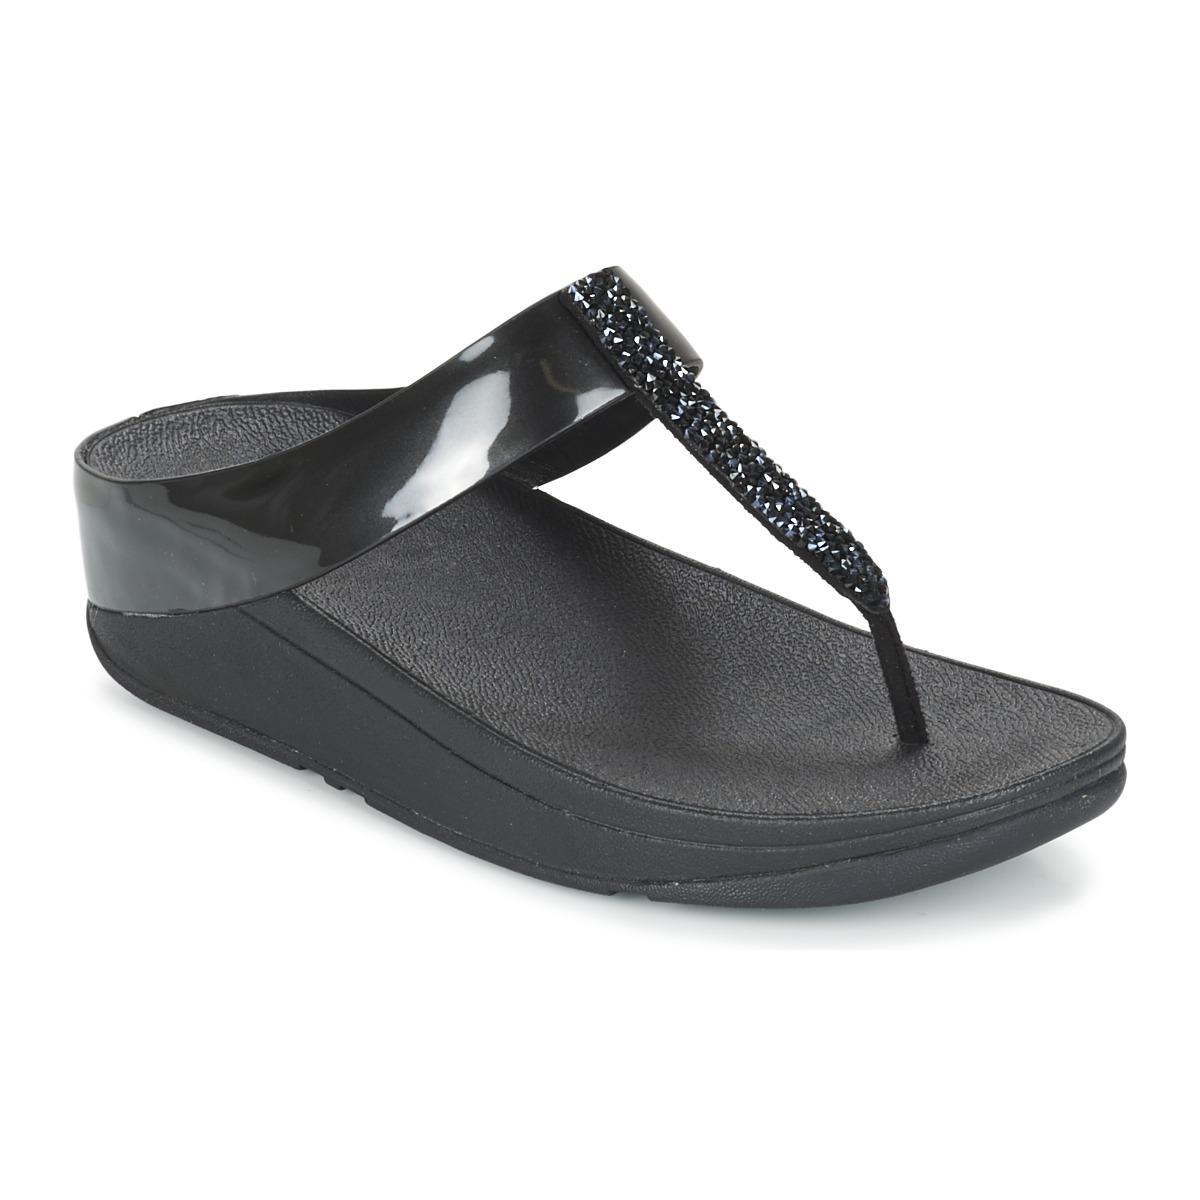 Fitflop Fino Flip Flop Sandal (Women) lkKFOIawPC